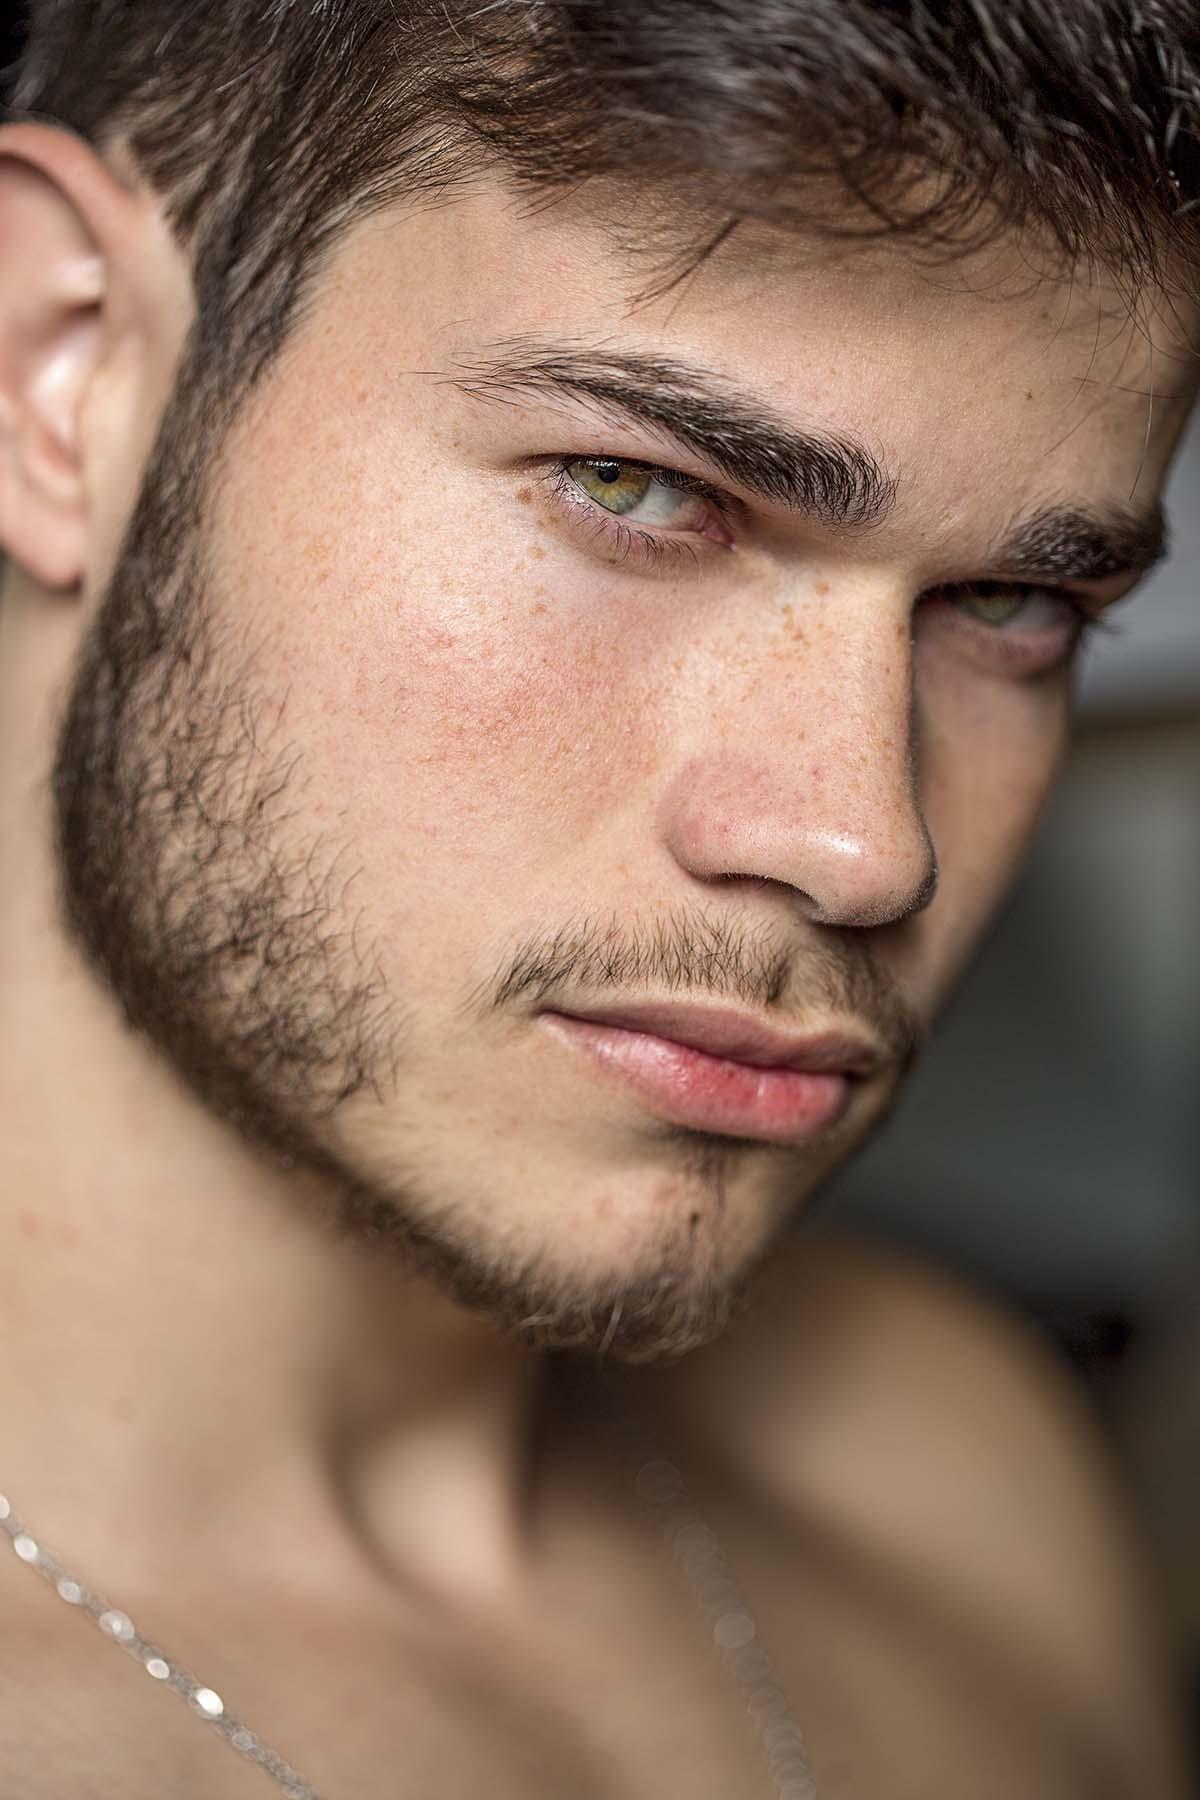 Matheus Arana by Ronaldo Gutierrez for Brazilian Male Model